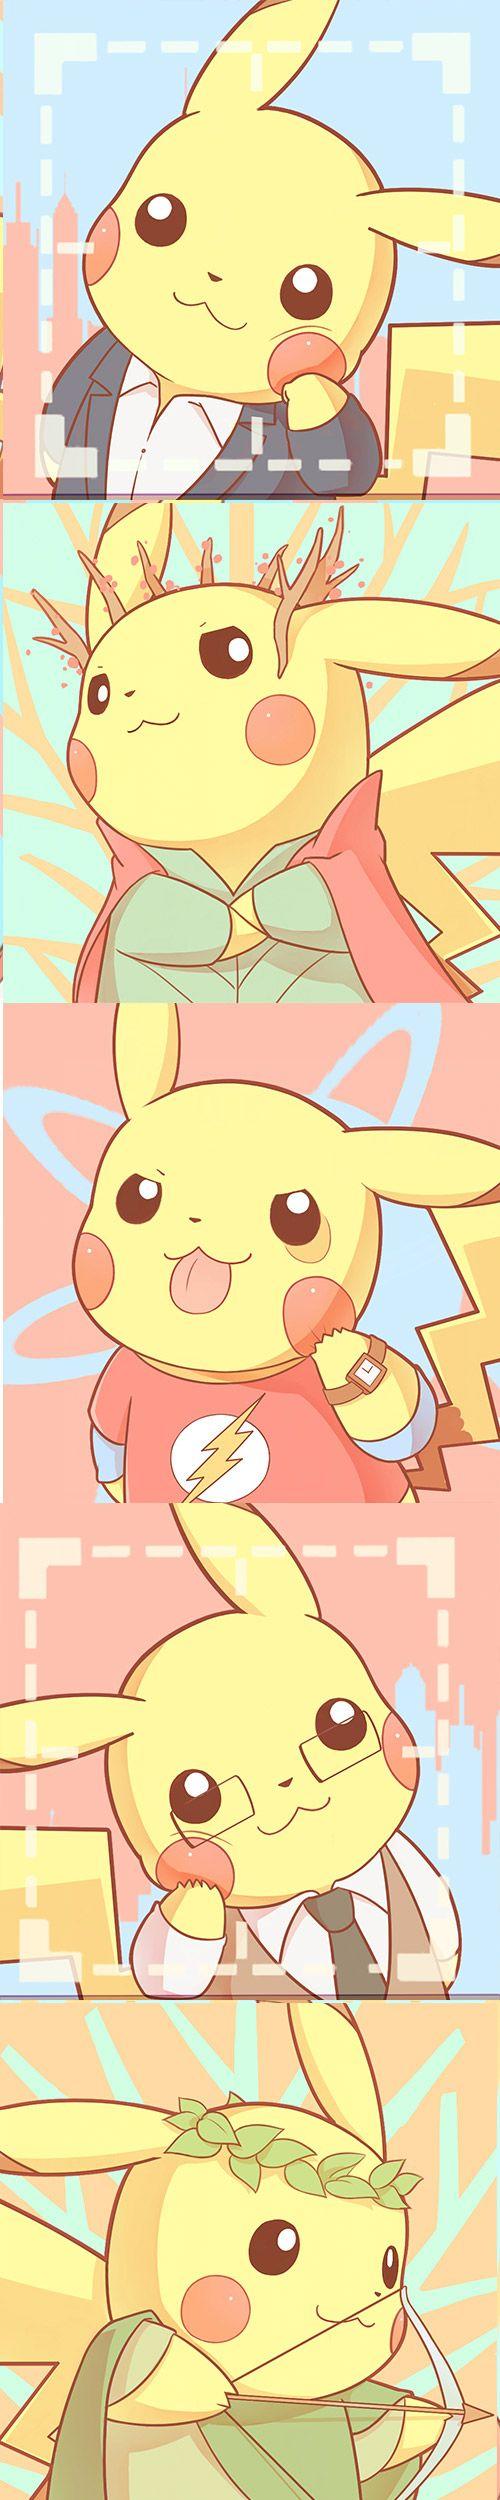 [Pokemon Daliy] Pikachu as Avengers characters